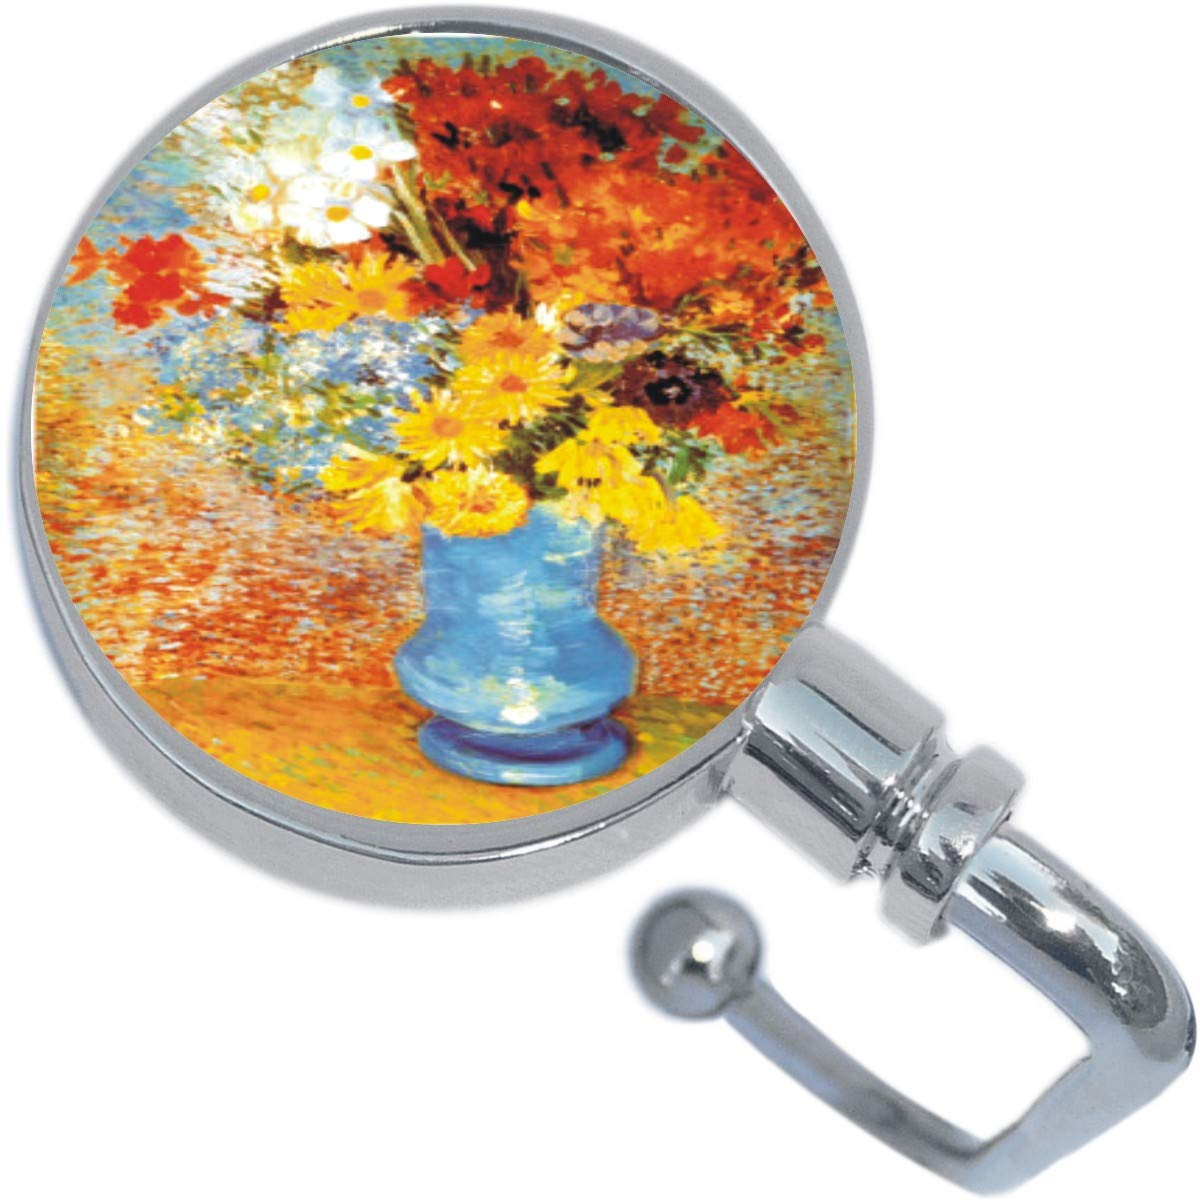 Vase Of Flowers Keychain Handbag Hook Retractable Folding